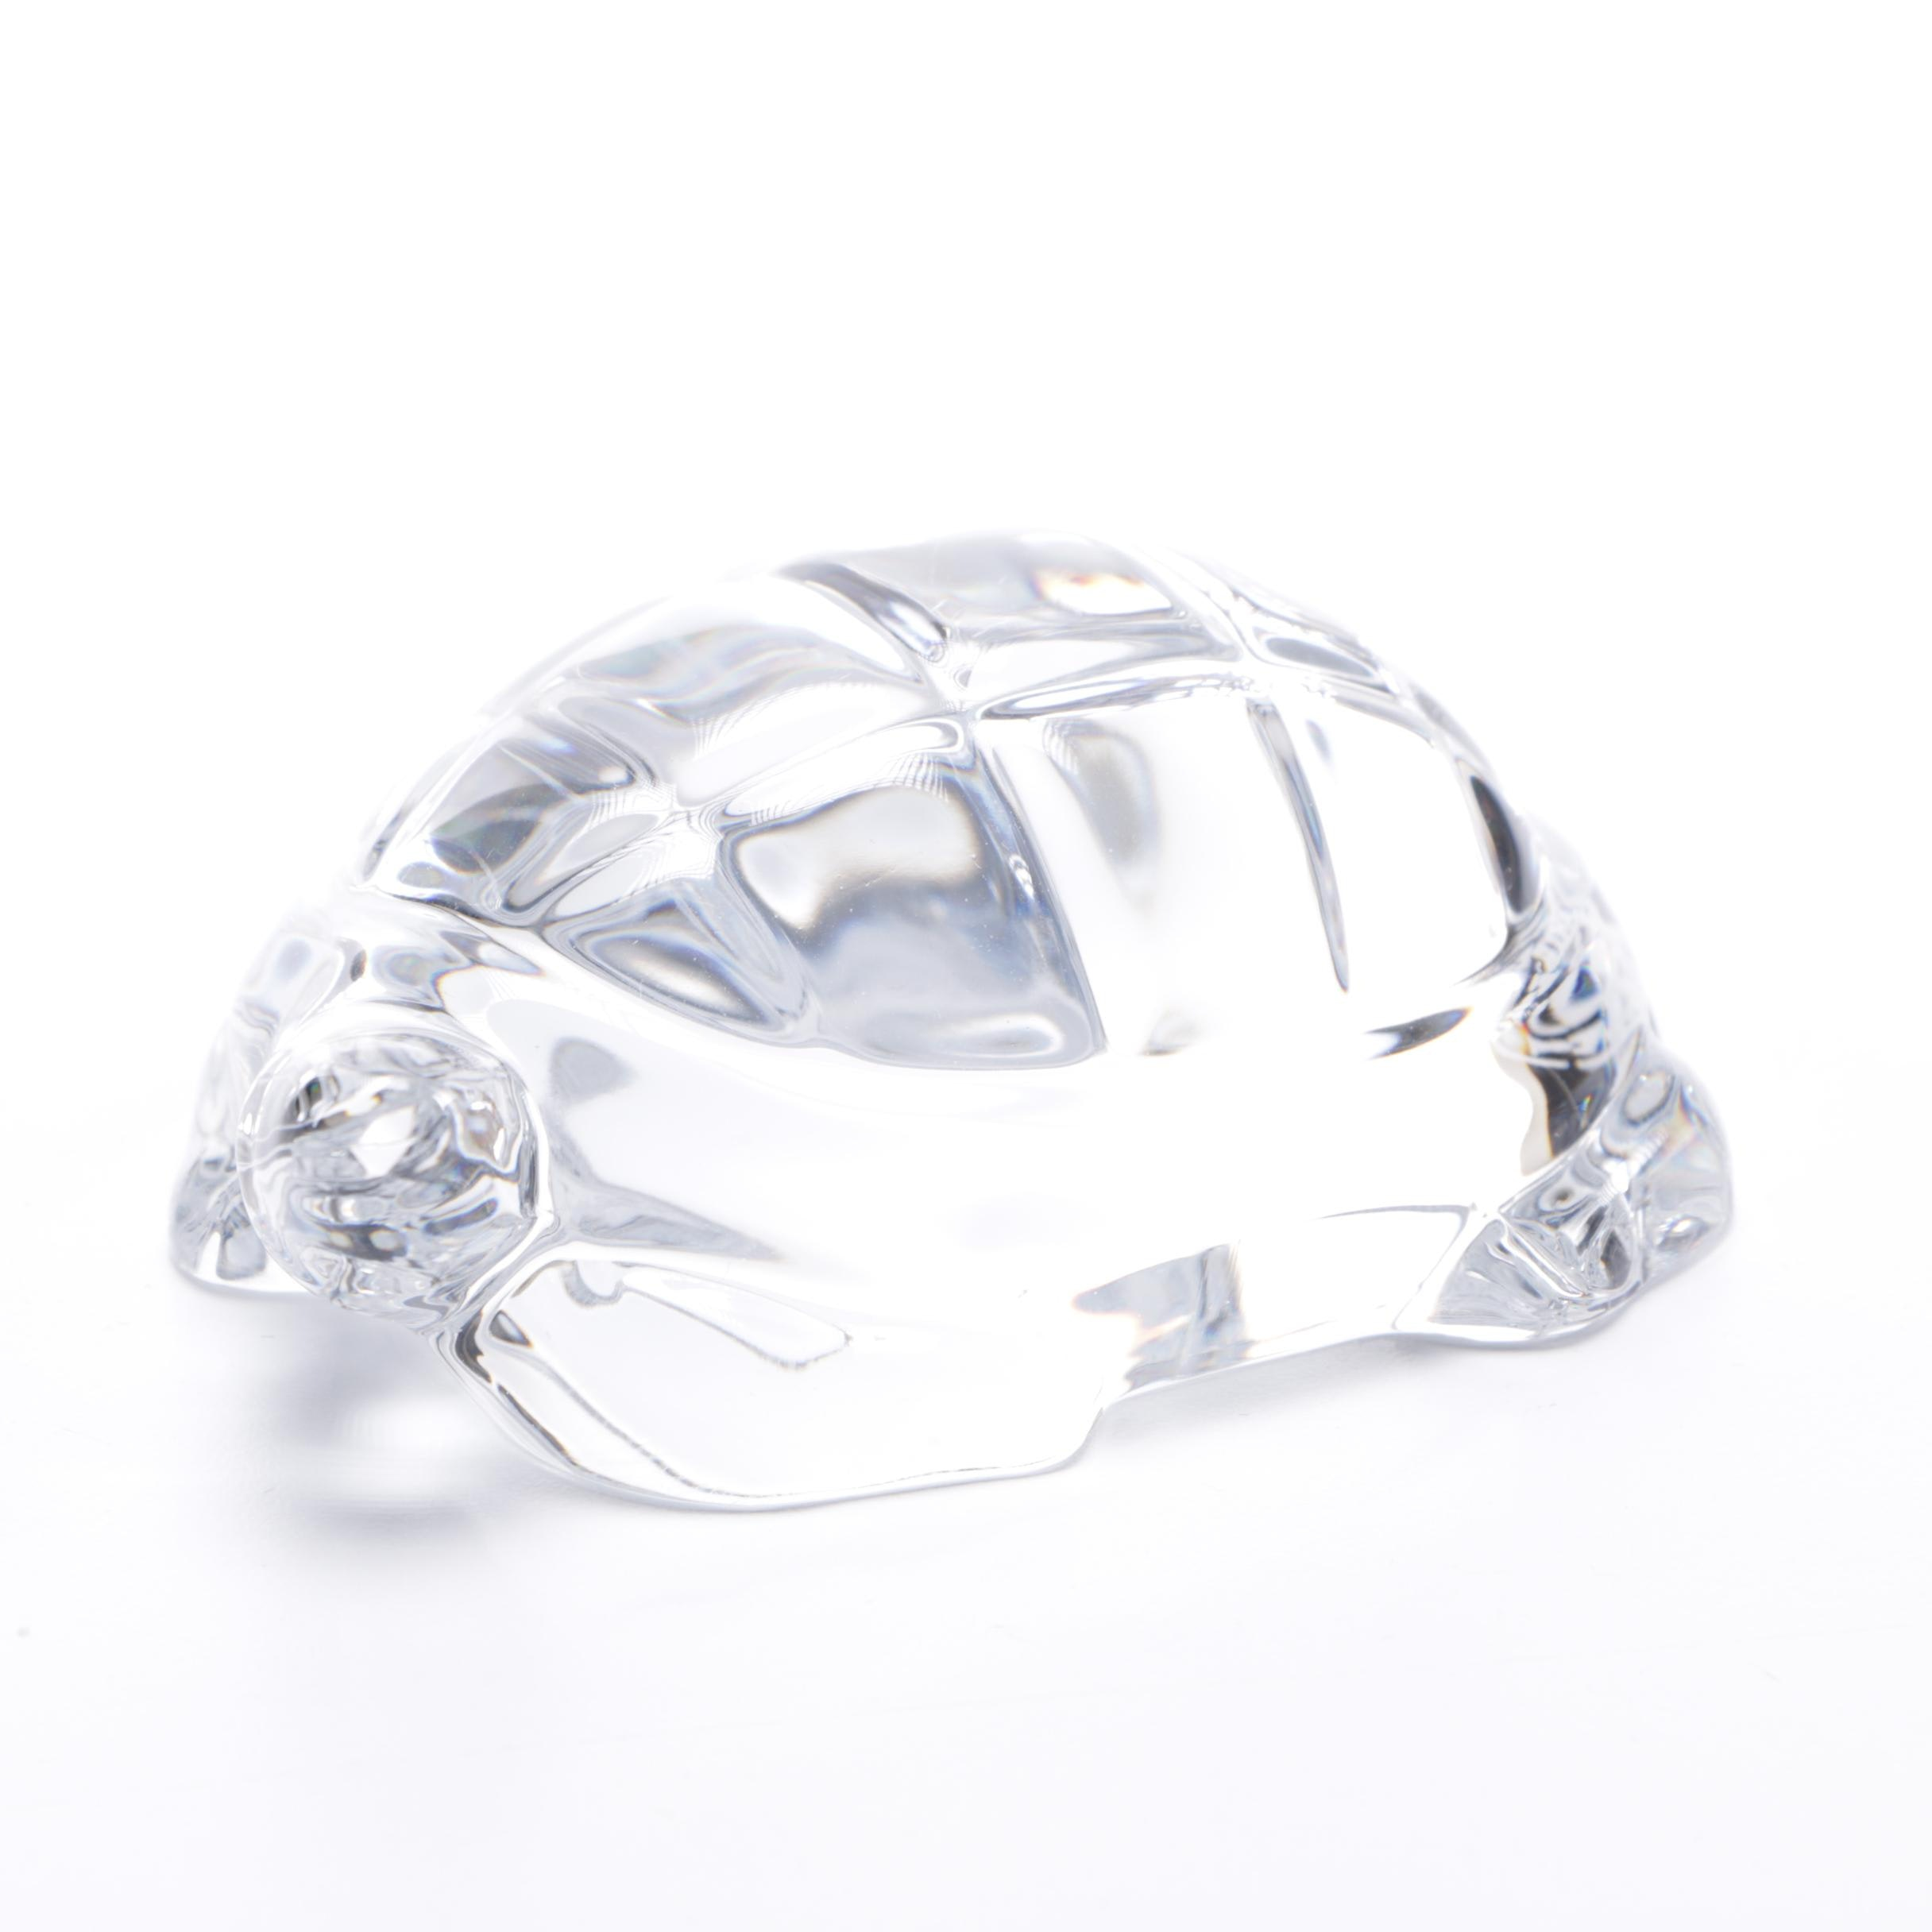 Baccarat Crystal Turtle Hand Cooler